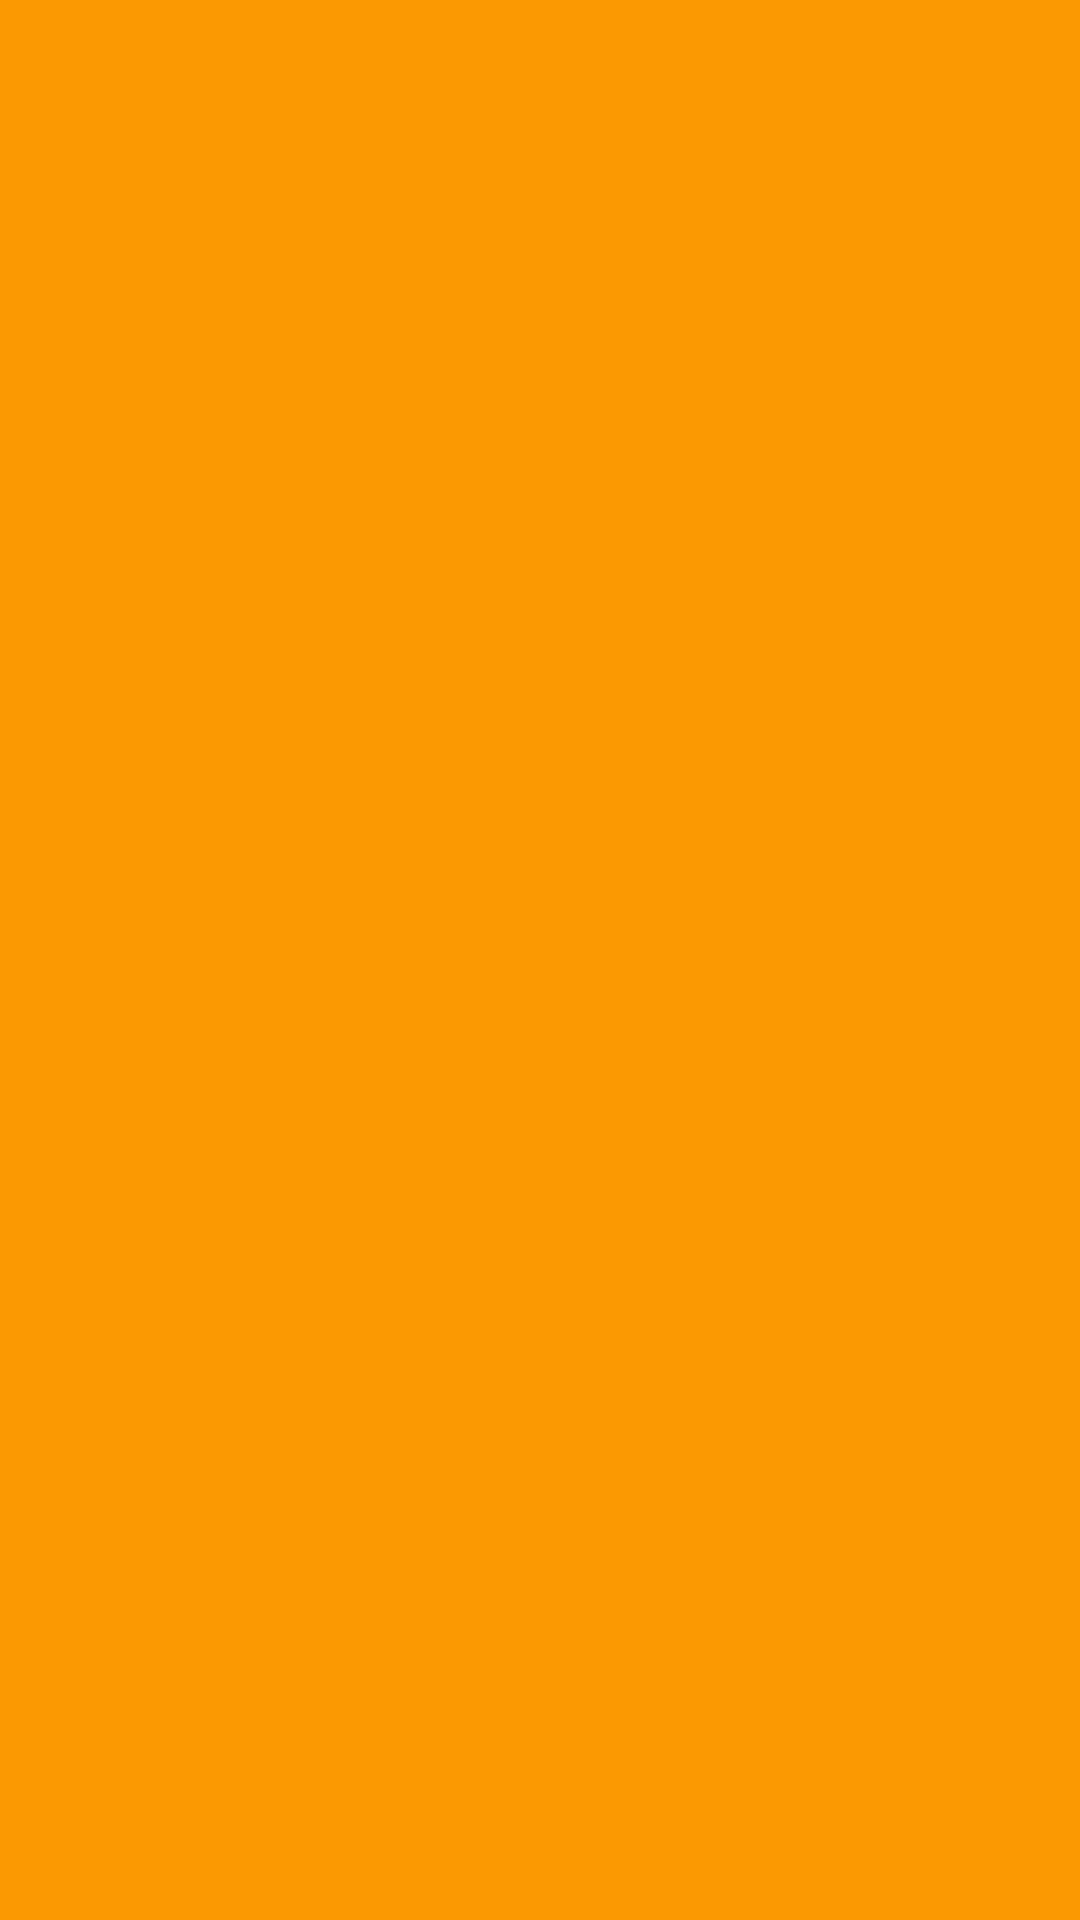 1080x1920 Orange RYB Solid Color Background